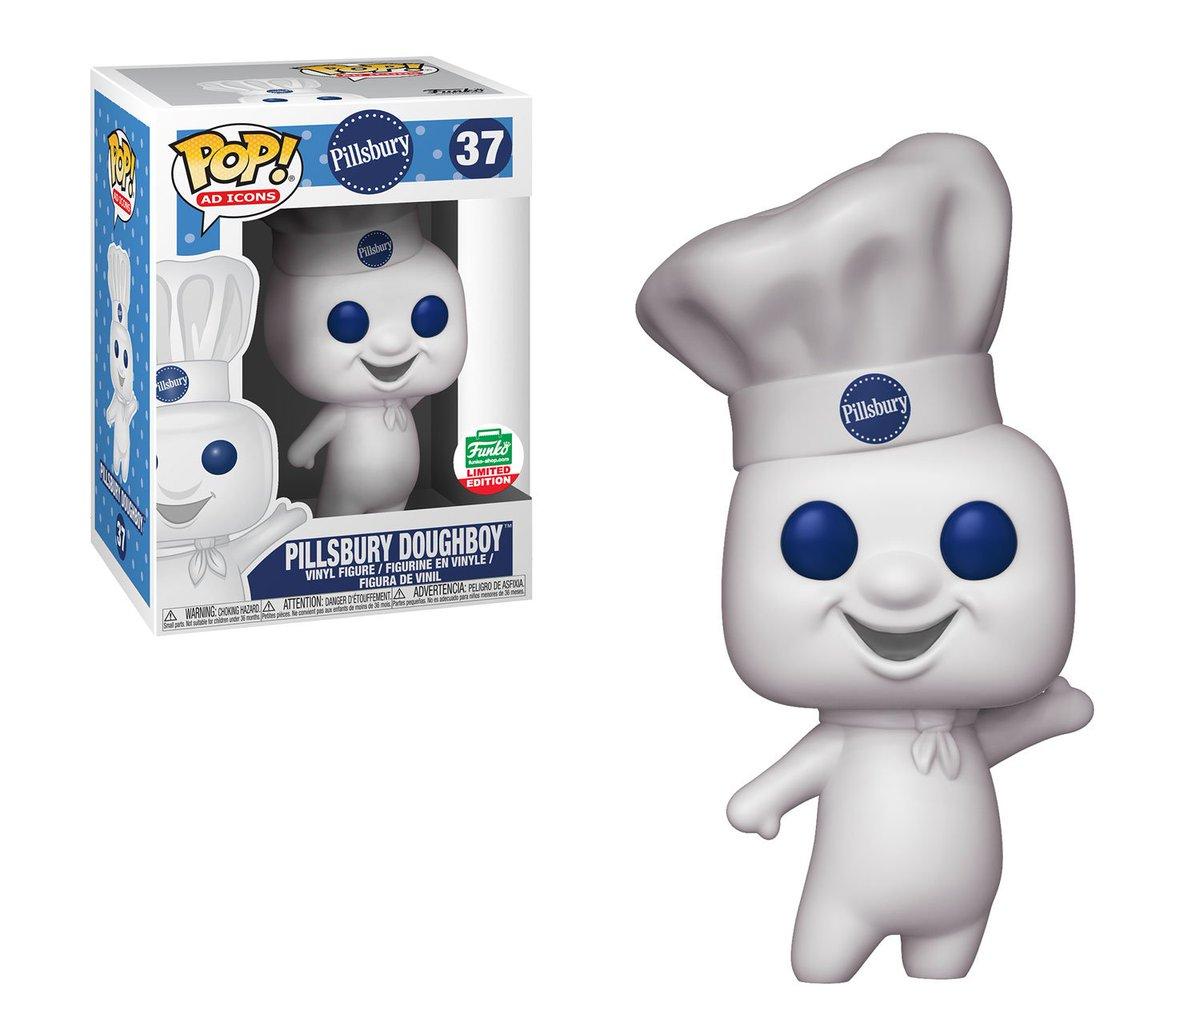 RT & follow @OriginalFunko for a chance to WIN a Funko Shop exclusive Pillsbury Doughboy Pop!